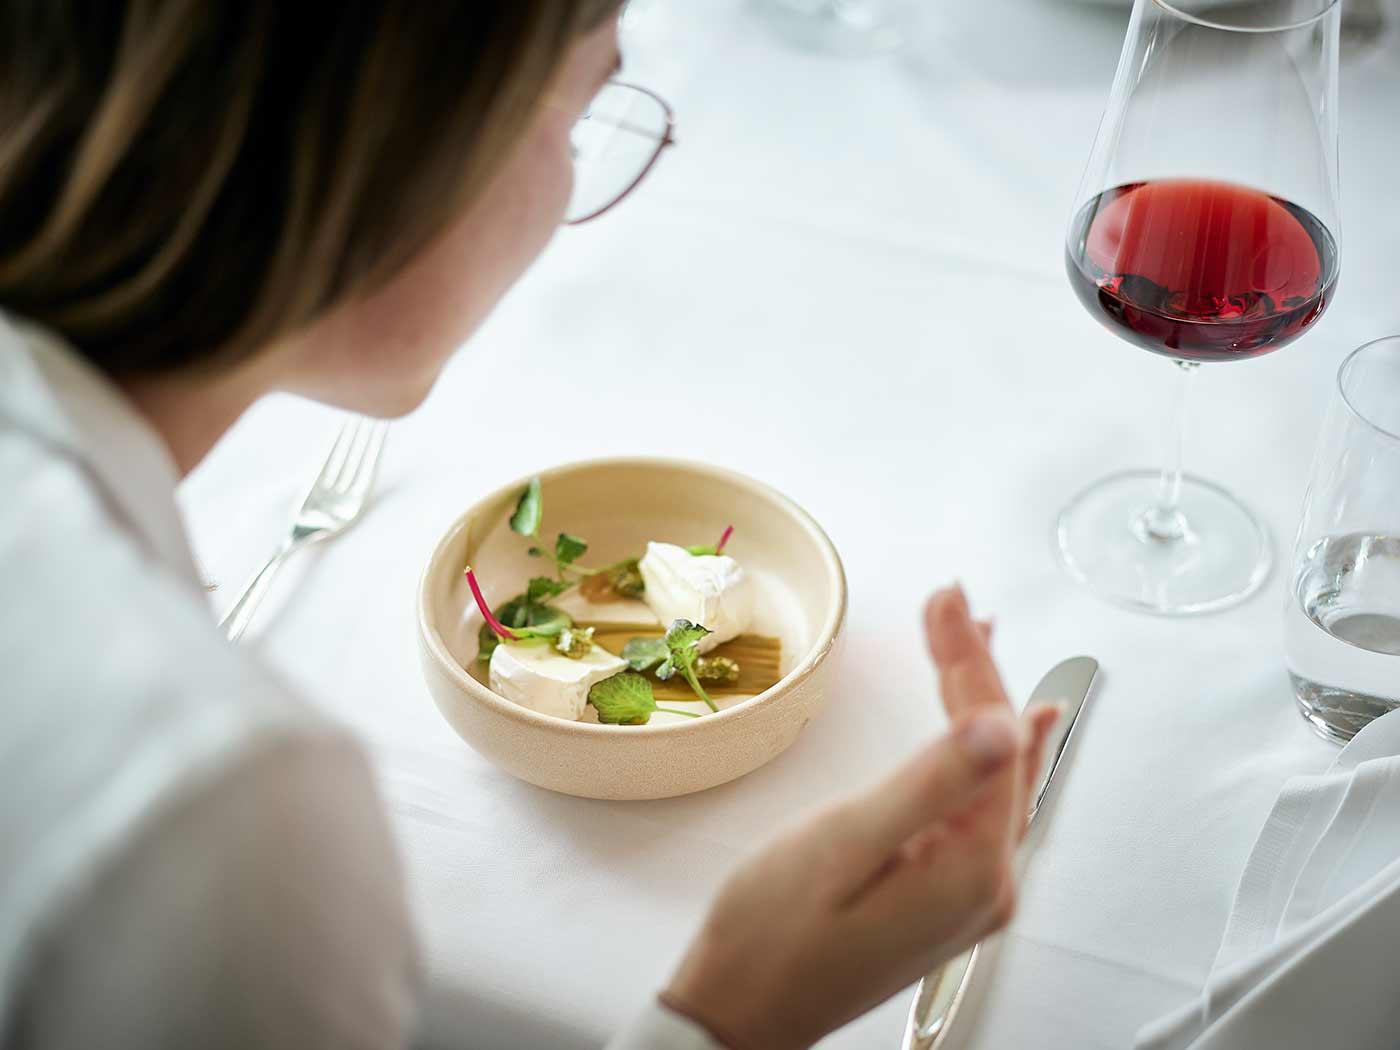 Frau riecht an einem Salat mit Käse